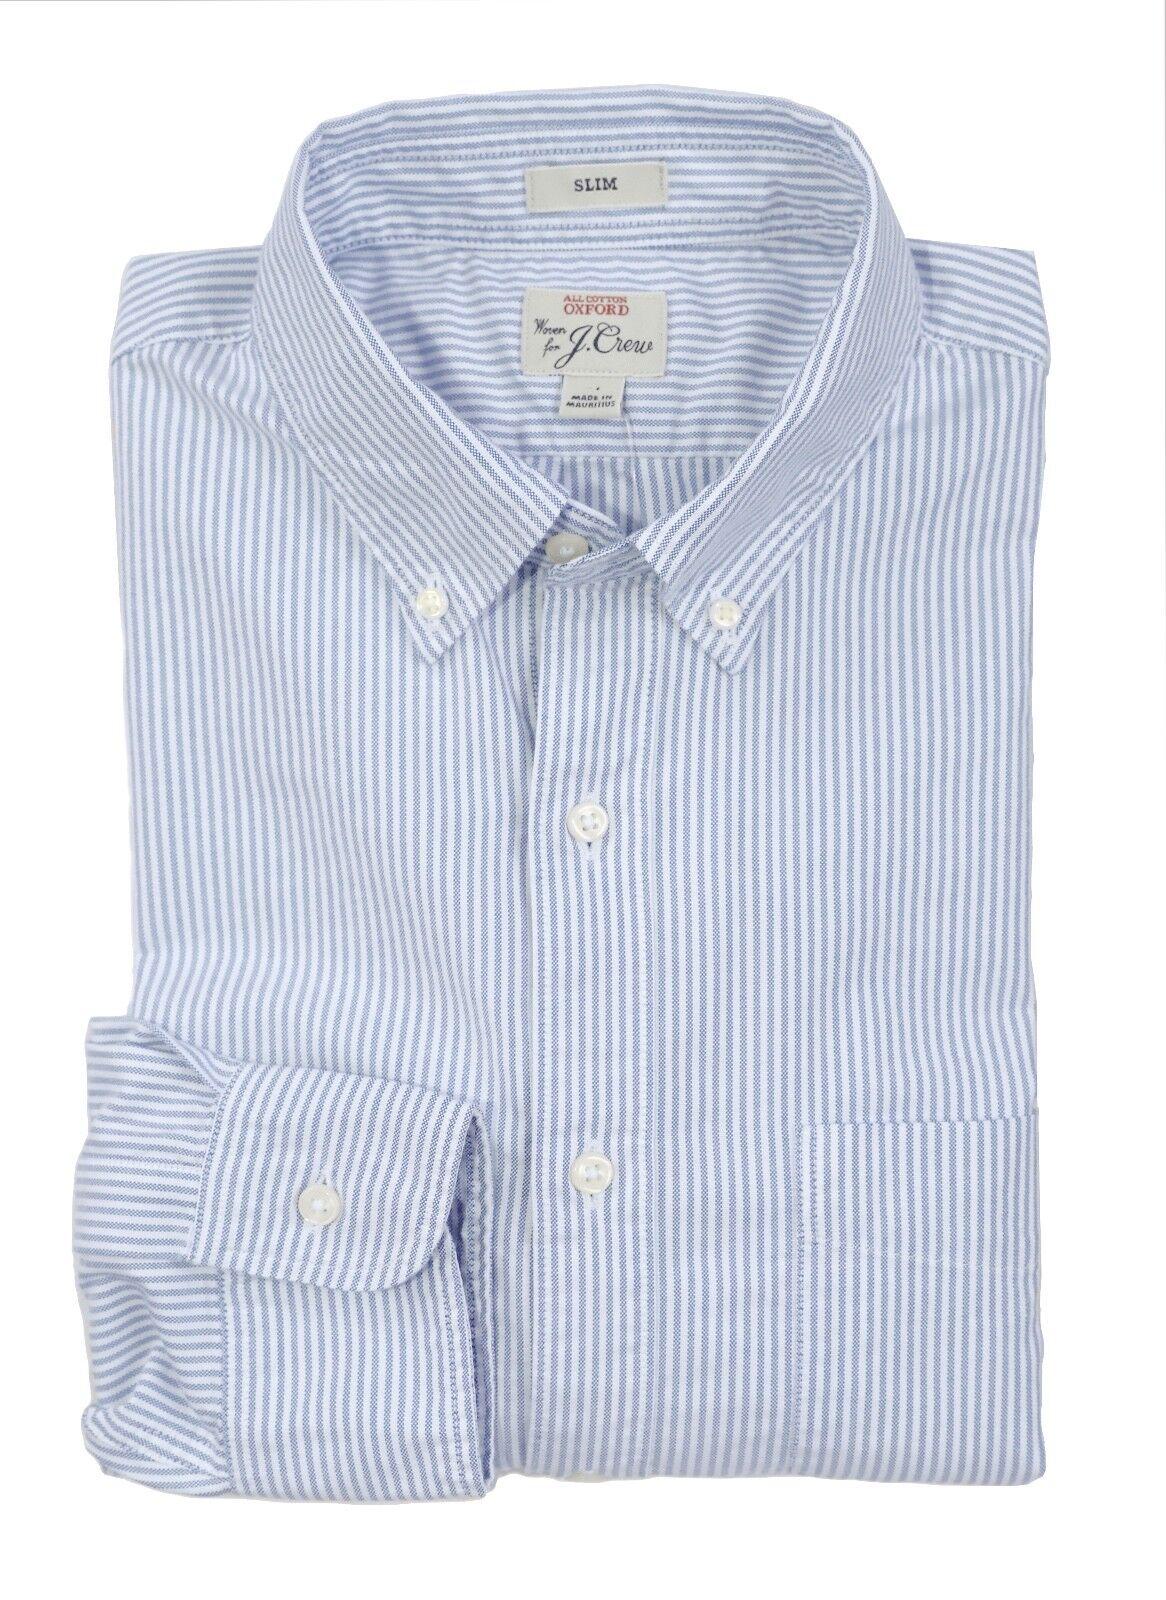 J.Crew Men's s Slim Fit - NWT - bluee & White Striped Oxford Cotton Shirt  H475